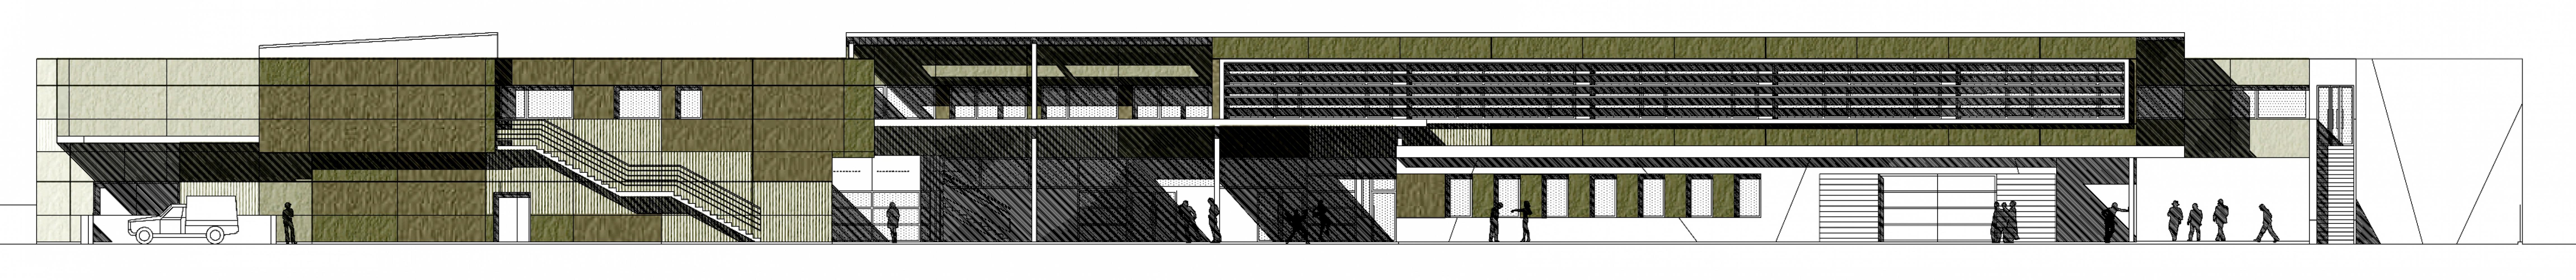 val_reuil01 Pascale SEURIN Architecte - Pascale SEURIN Architecte